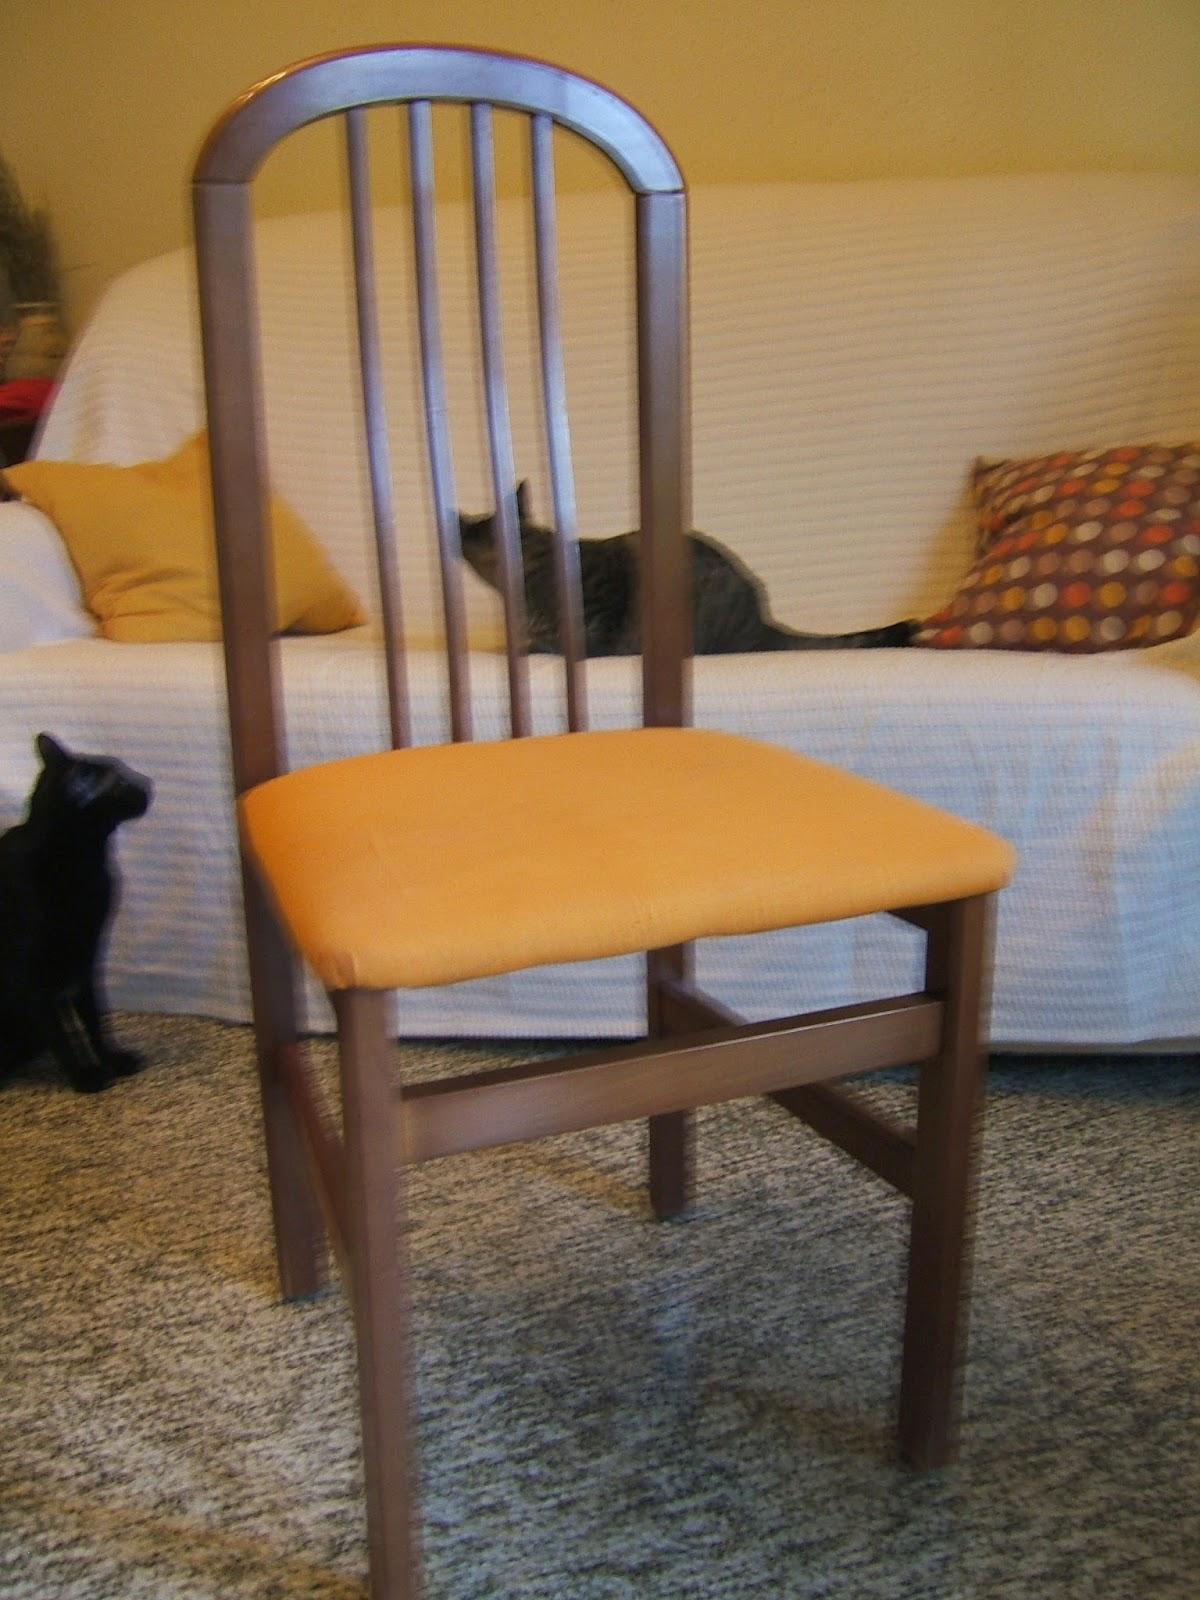 Grace blog 5 pasos para tapizar sillas - Tapizar una silla ...